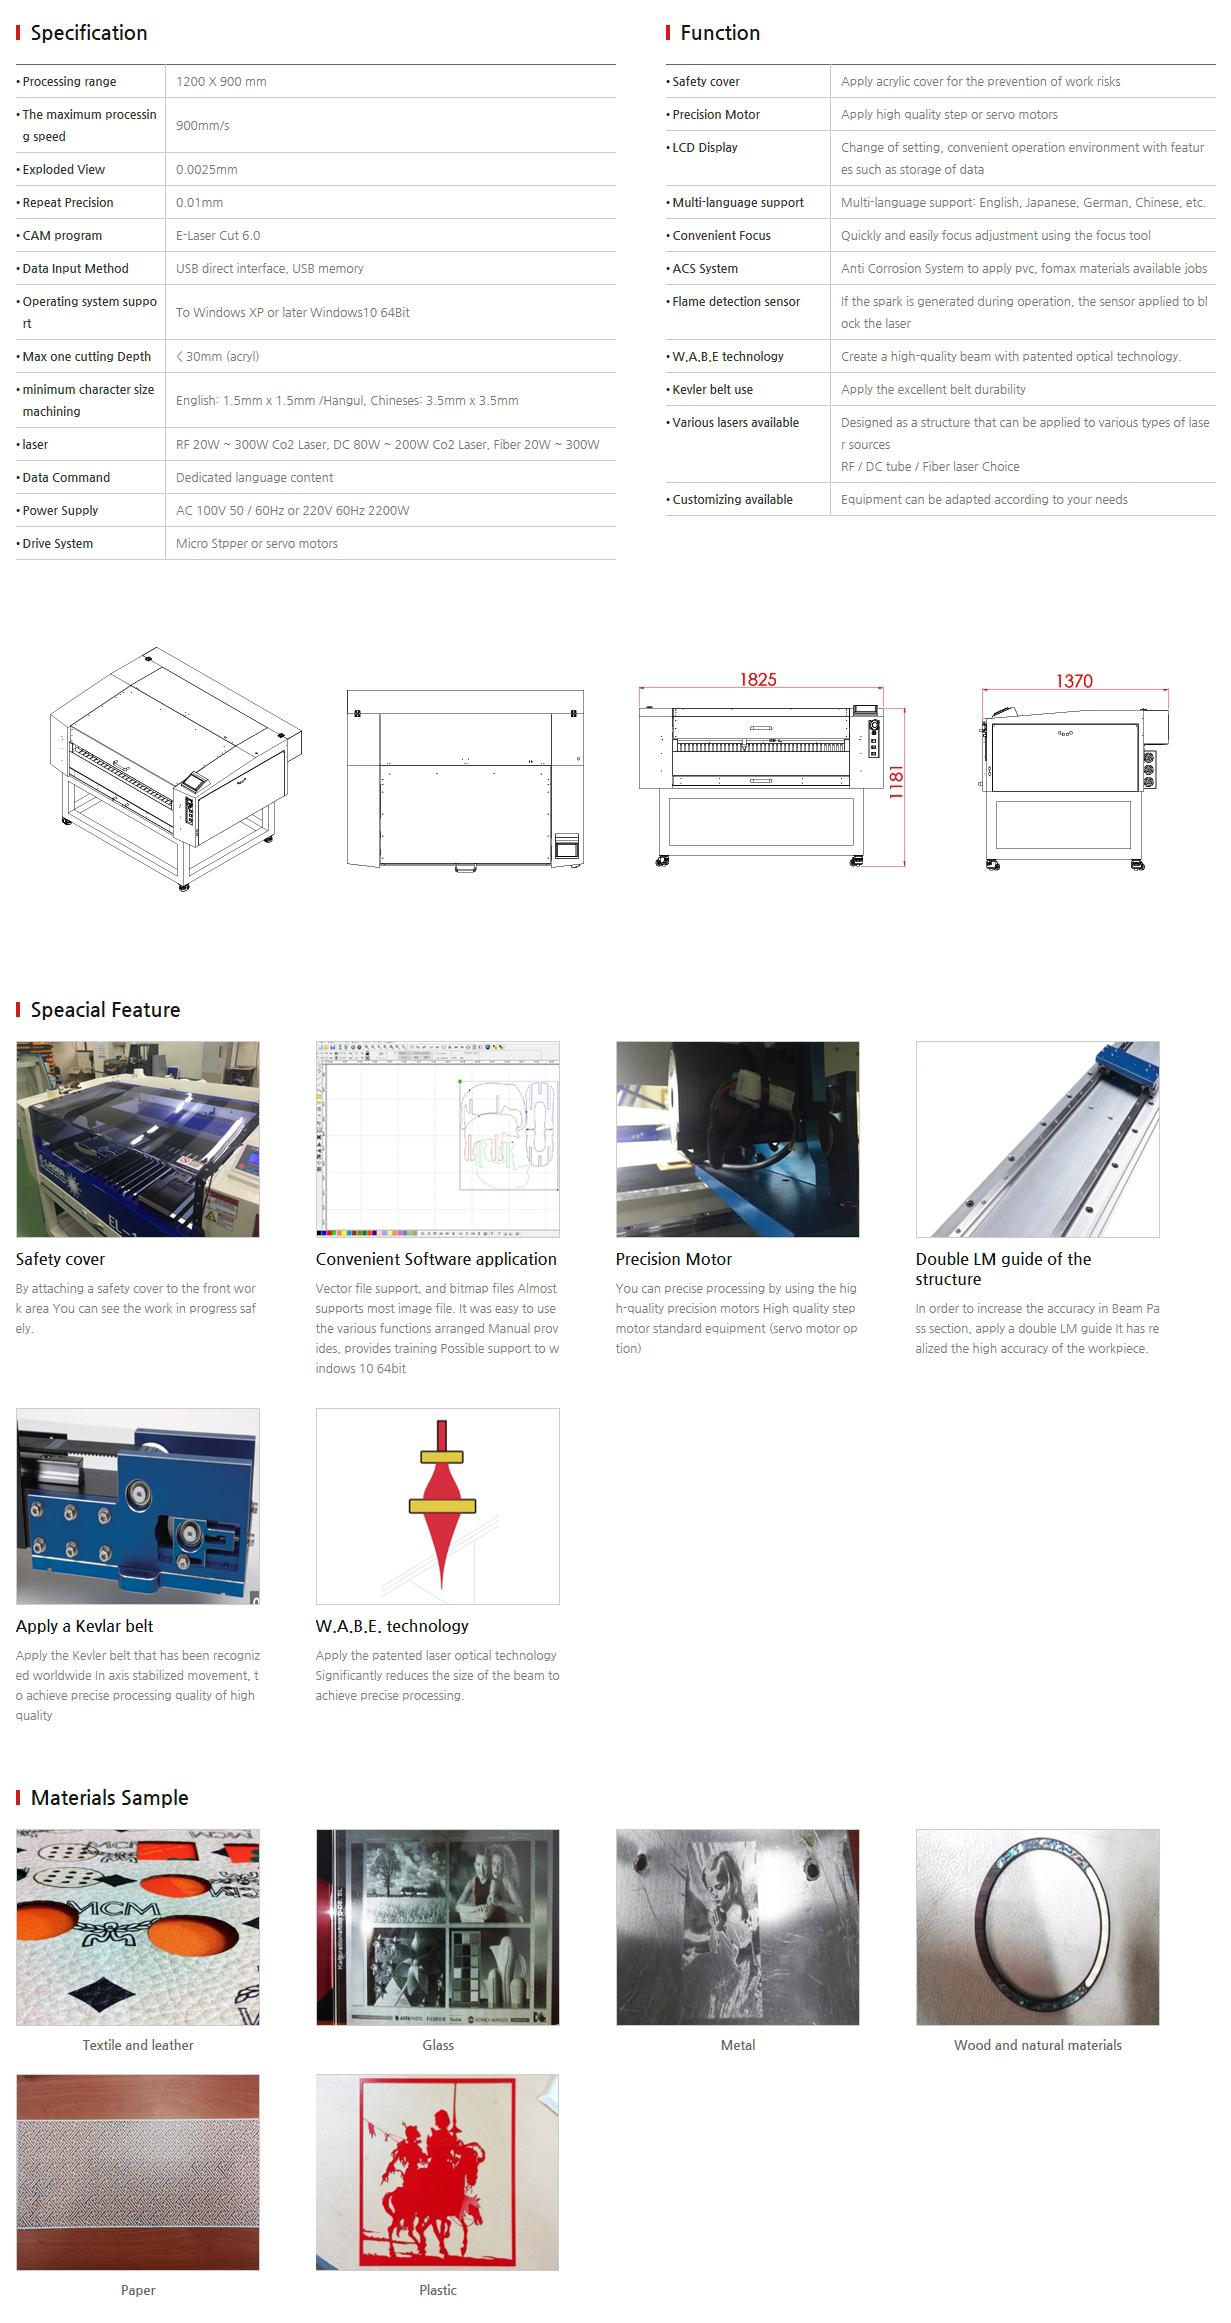 E-LASER Laser Cutting (Only non-metal) EL-1290 LK